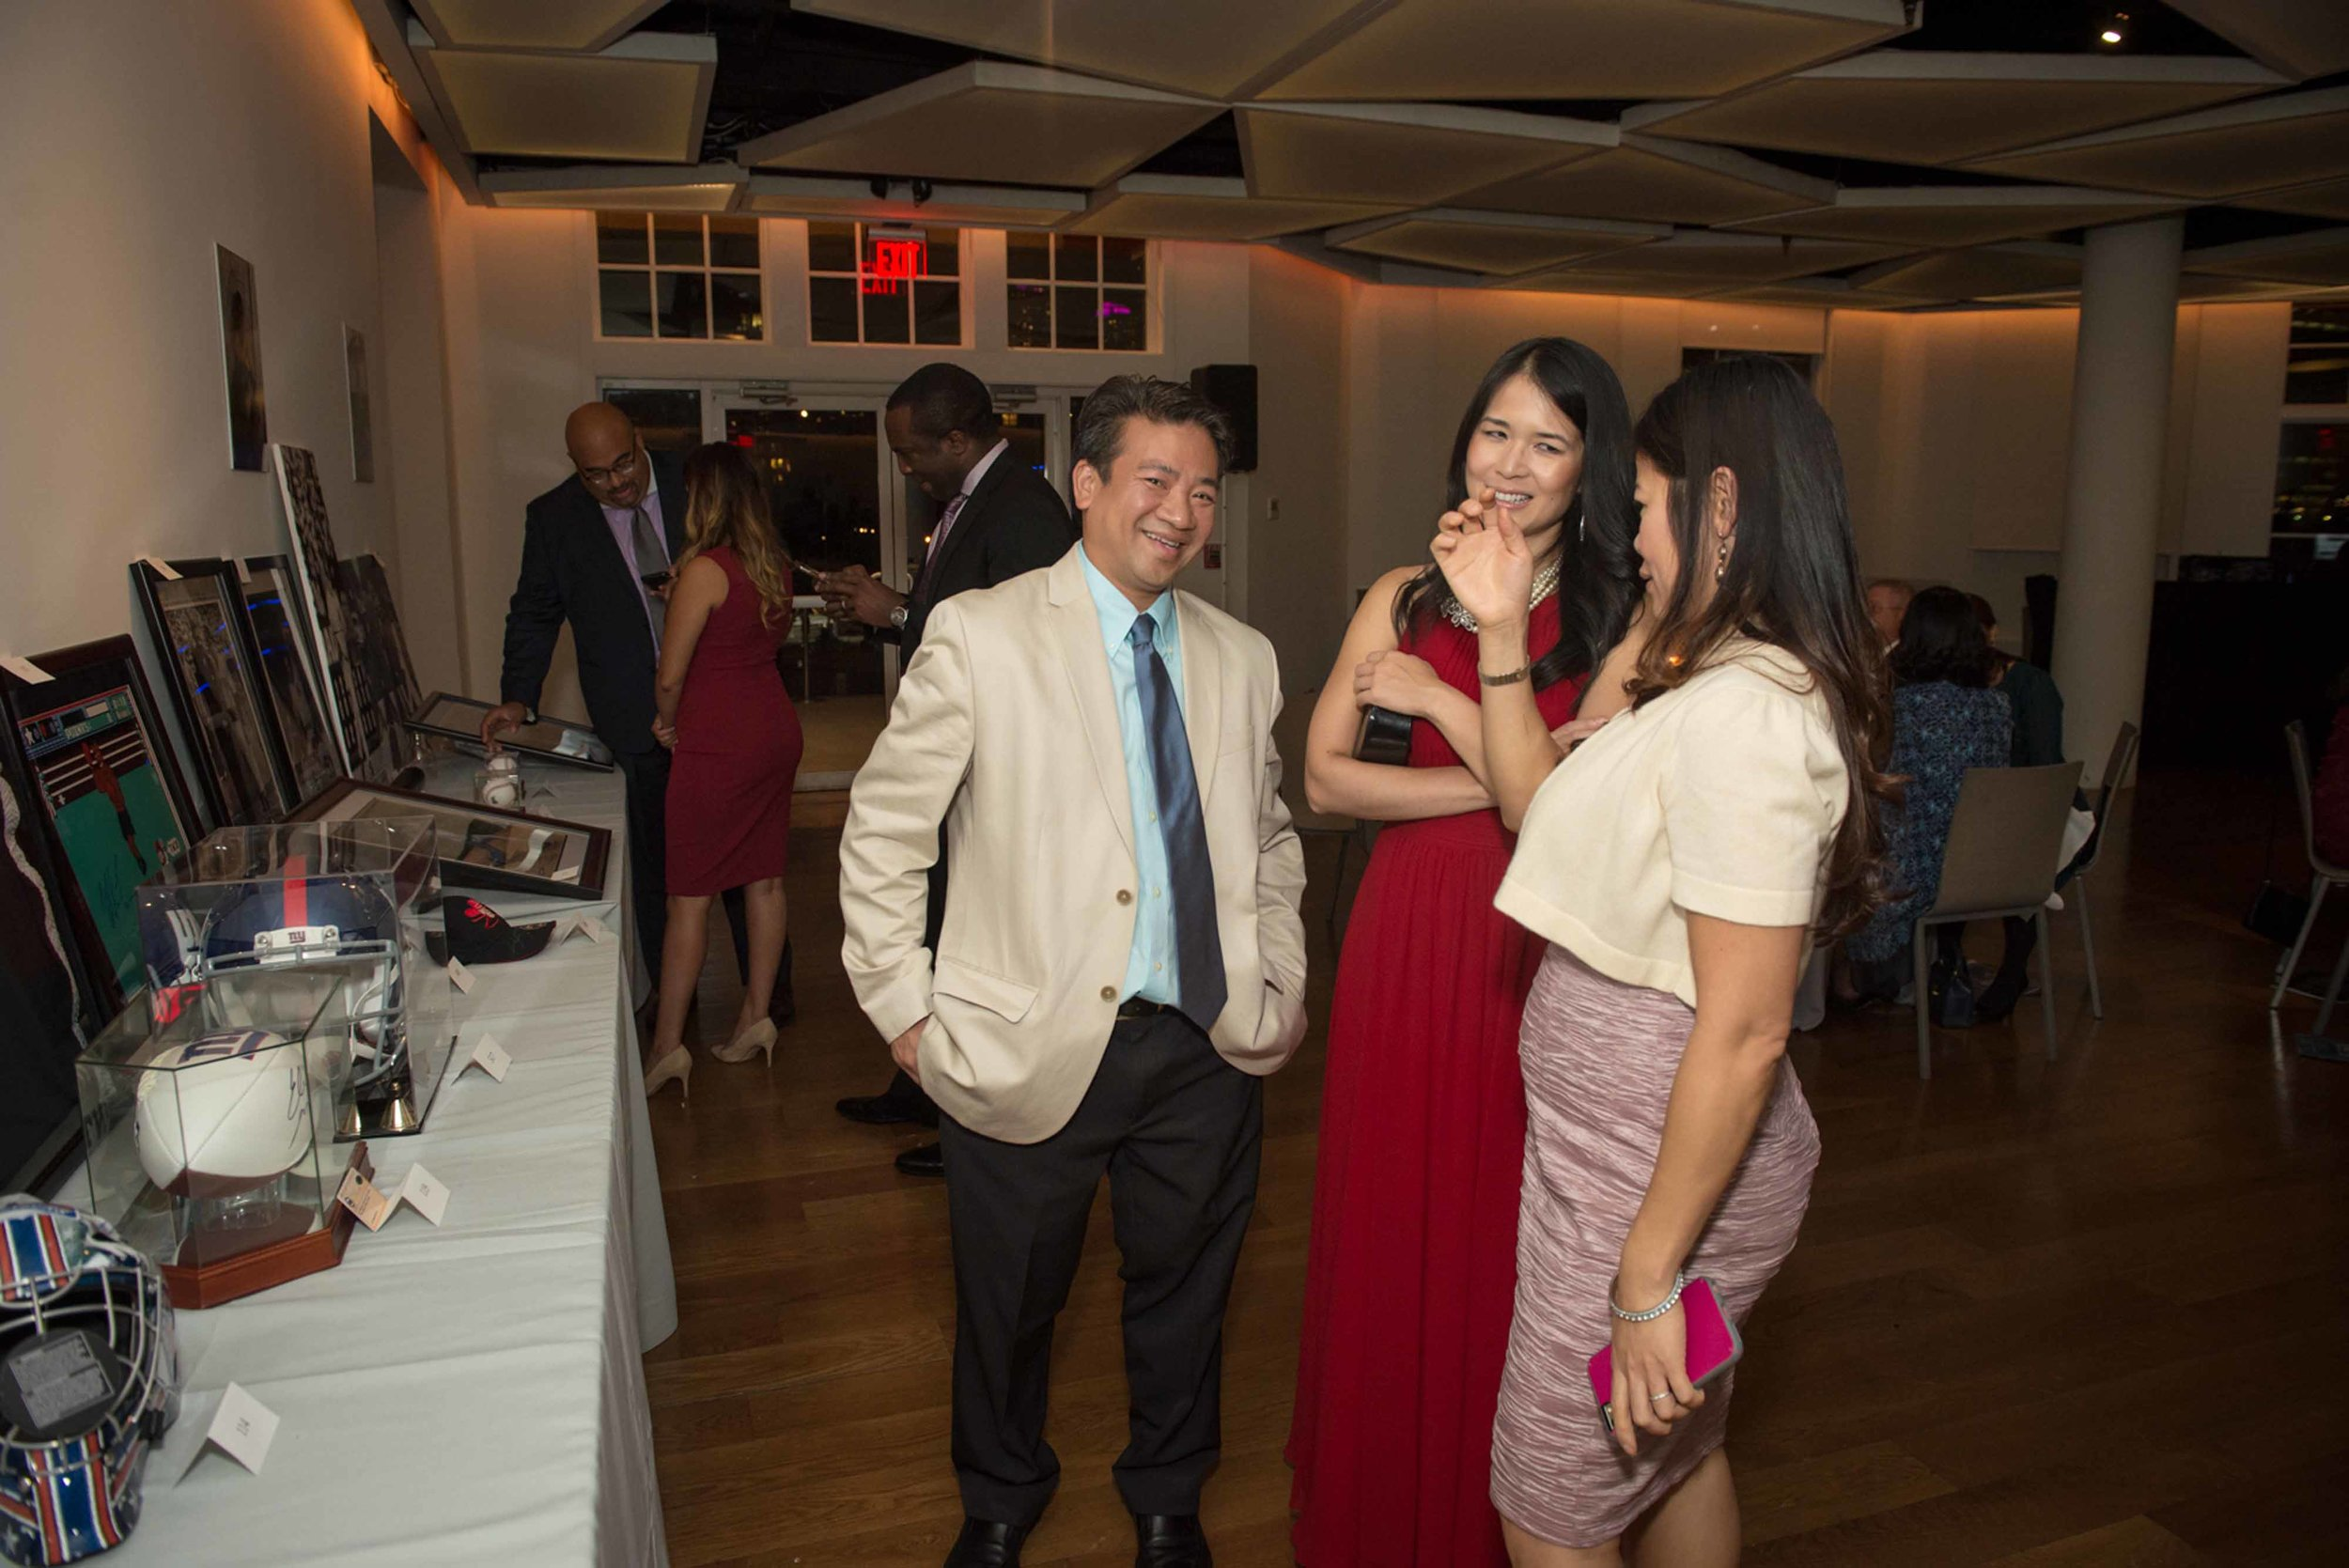 2017-10-21 Zimele USA 6th Annual Gala - Maritime Parc - Jersey City NJ_0212.jpg